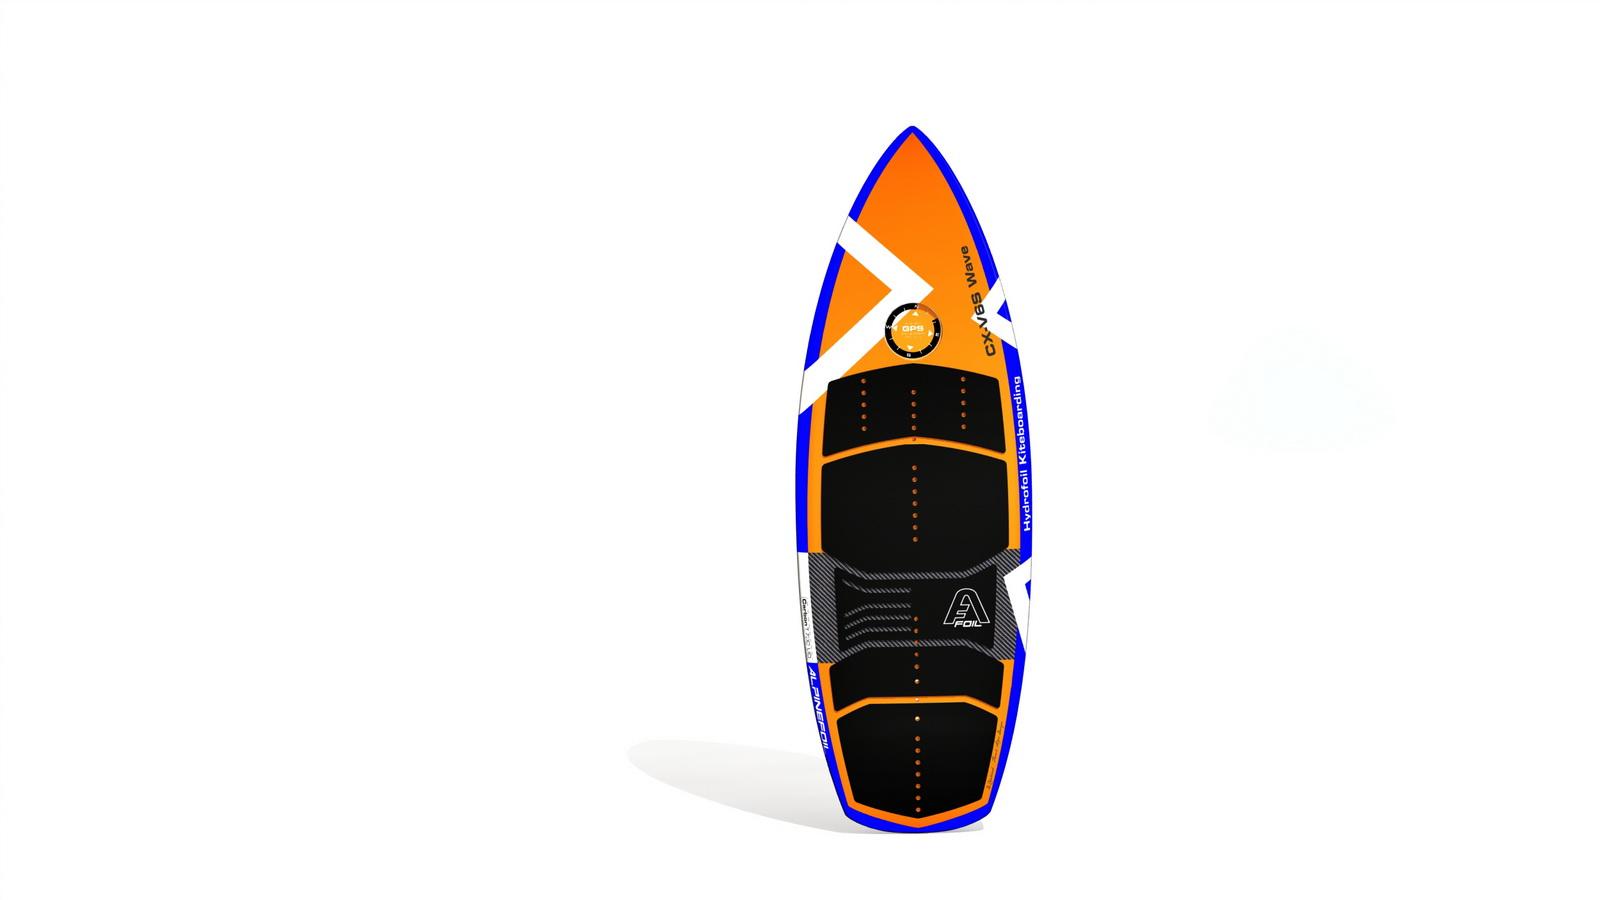 Kitefoil foilboard alpinefoil cx v6s wave